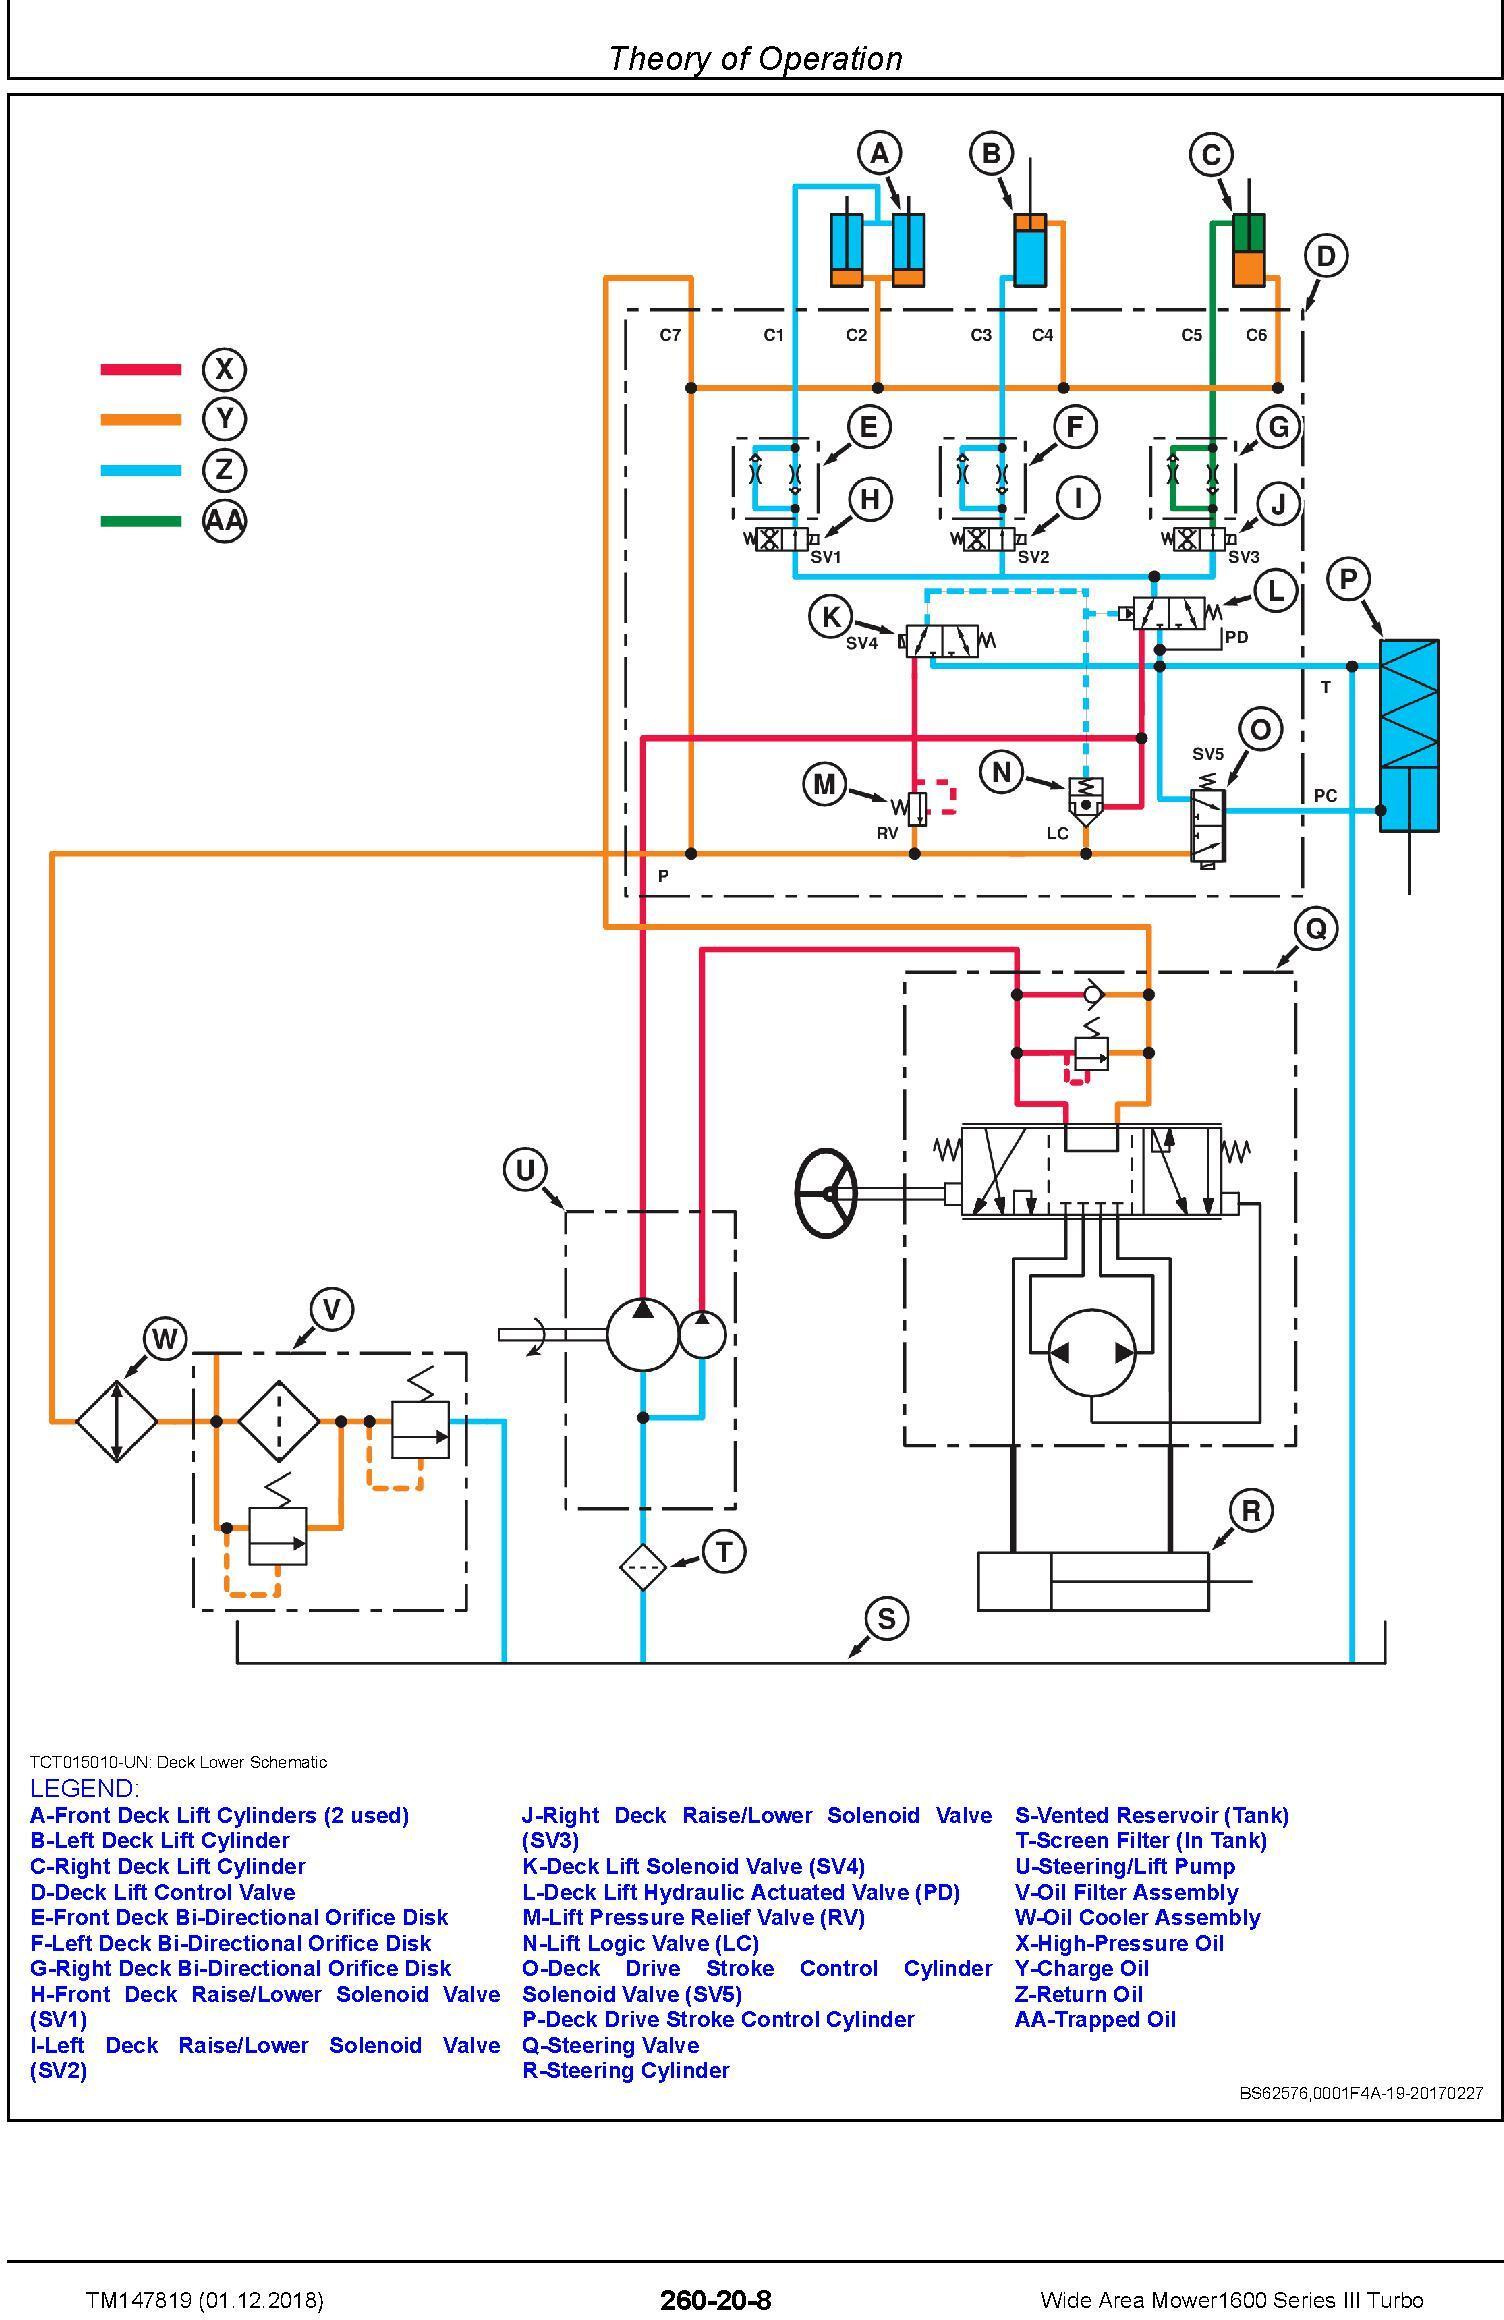 John Deere Wide Area Mower1600 Series III Turbo (SN. 405001-) Technical Manual (TM147819) - 3